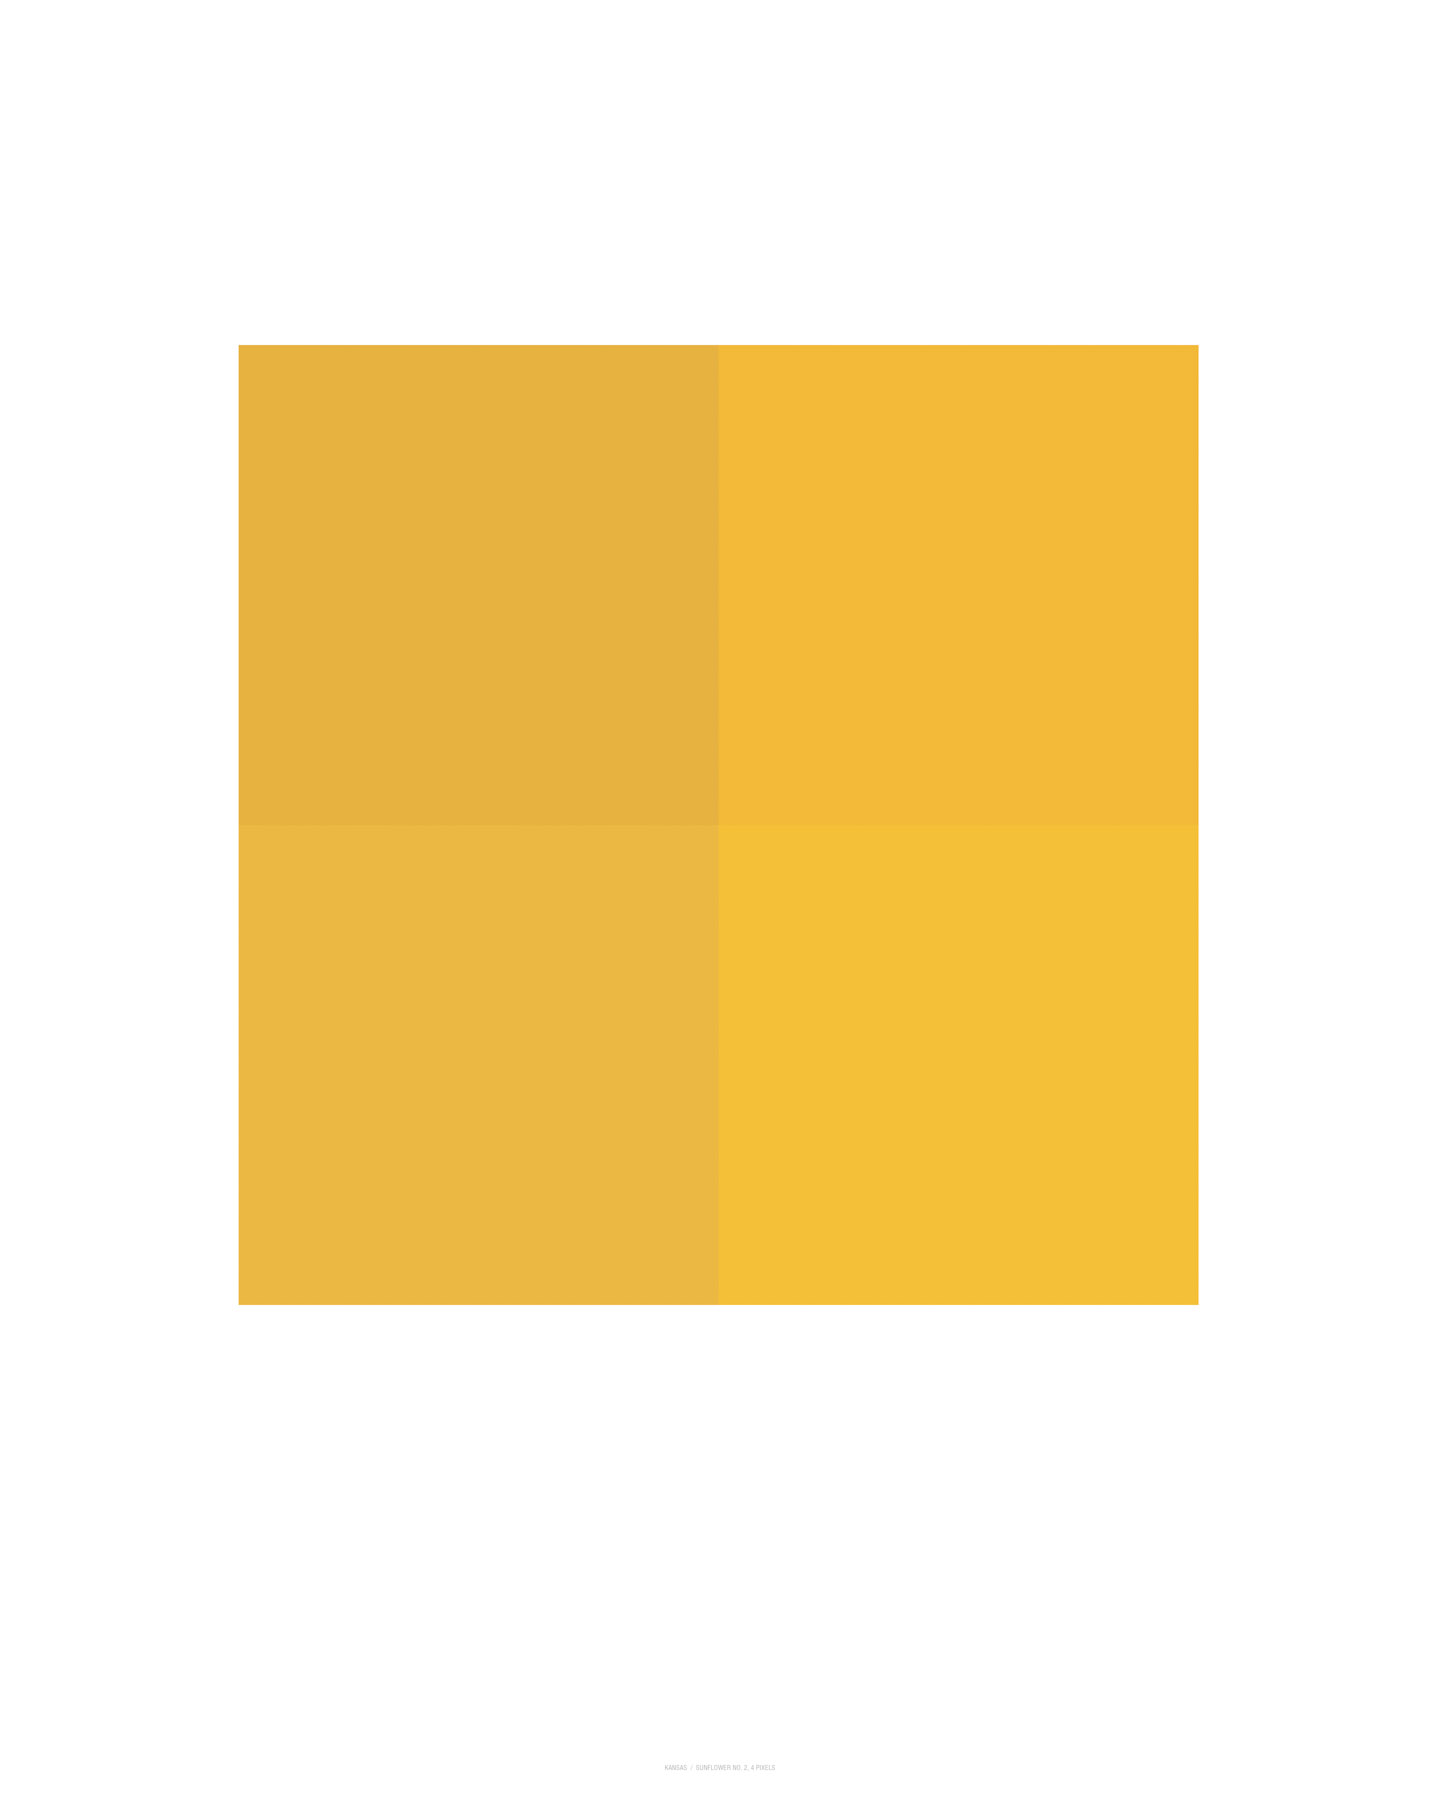 Sunflower No. 2, 4 Pixels